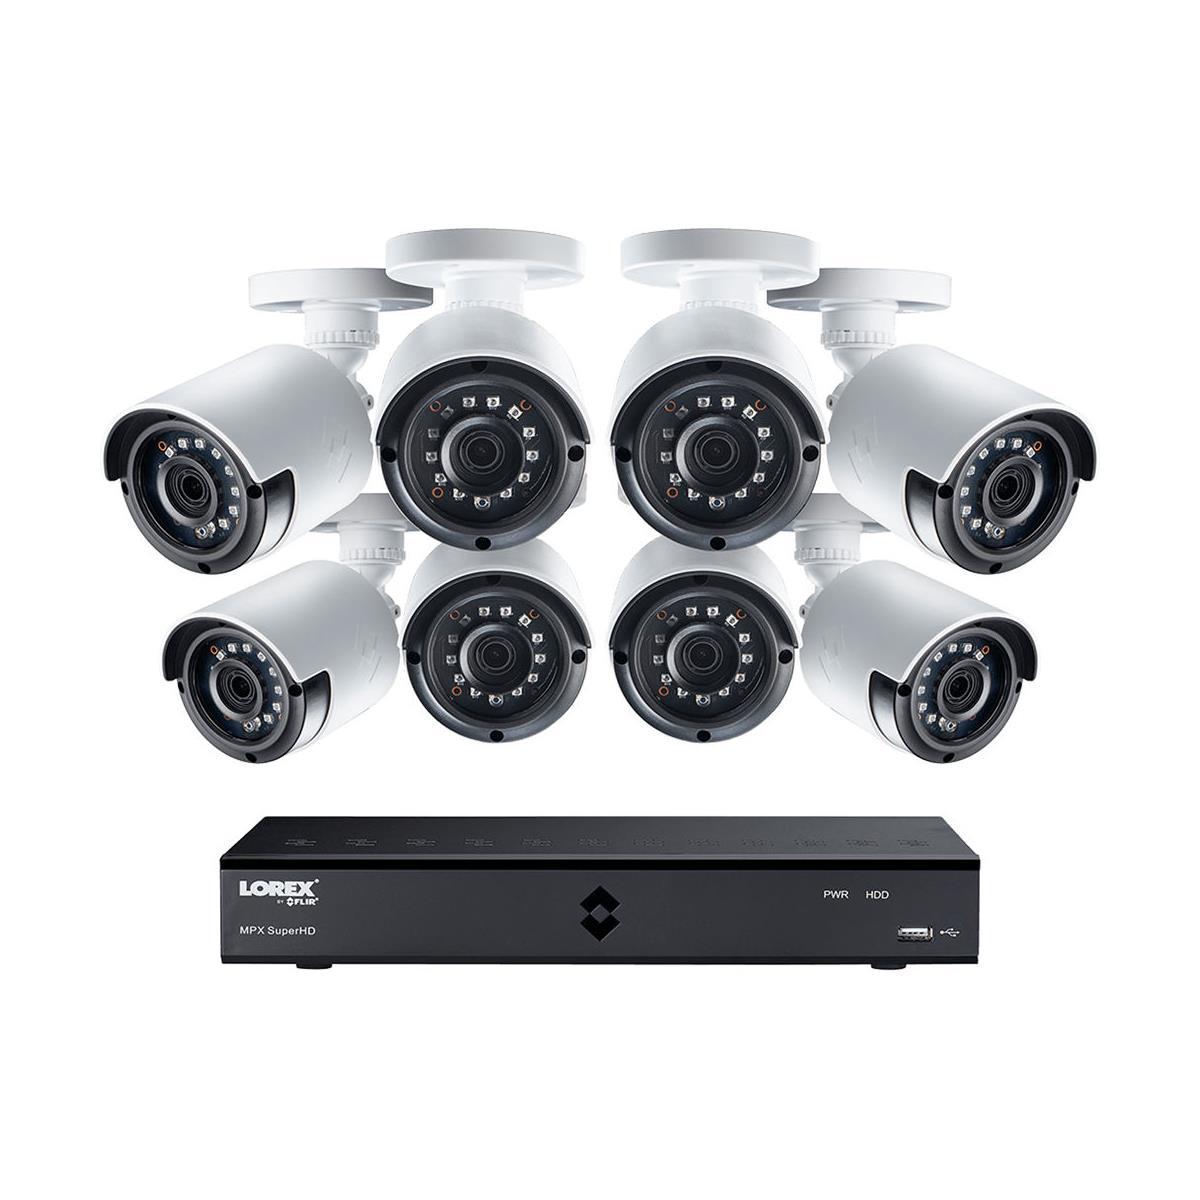 Lorex 16-Ch 2K Security System & 2TB DVR: 16  x 4MP Cameras $699, 12 Cameras $619,  or 8 Camera $499 + free s/h